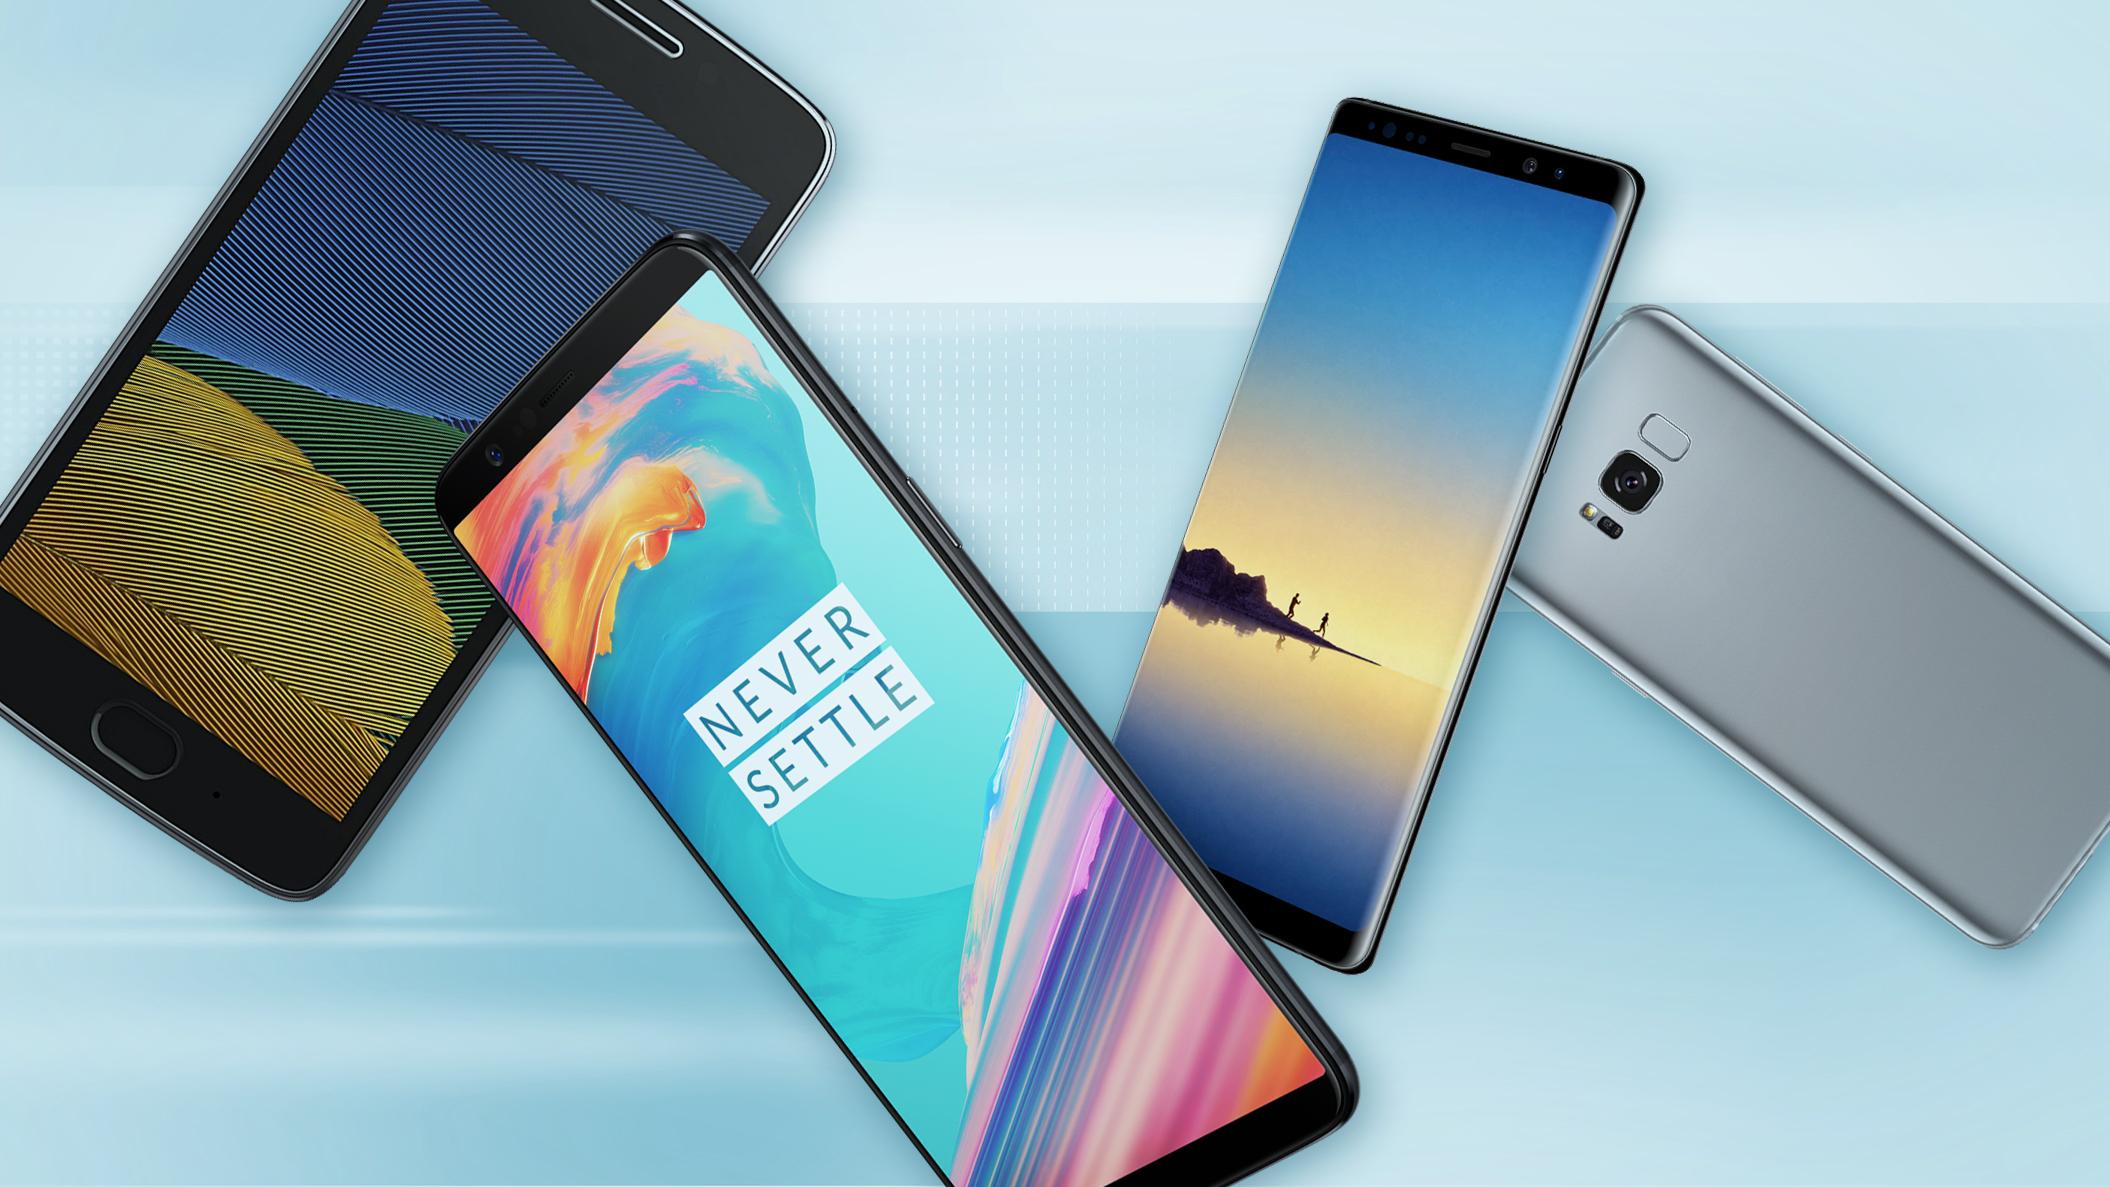 classifica migliori 5 smartphone top di gamma aprile 2018